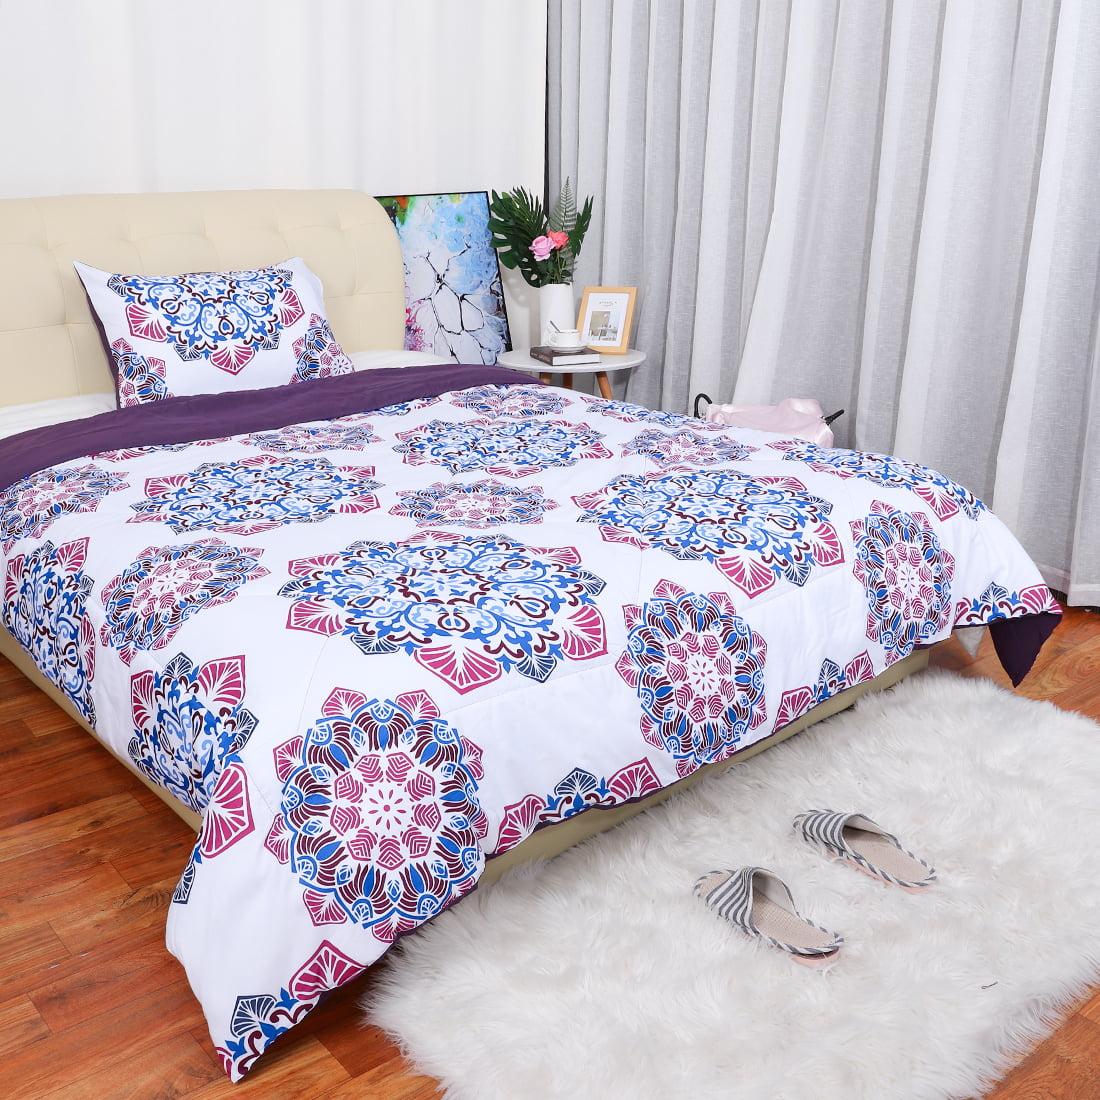 Microfiber Mandala Chic Boho Bohemian Sytle Circles Elephant Pattern Bedding Comforter Sets Purple Queen Size Walmart Com Walmart Com